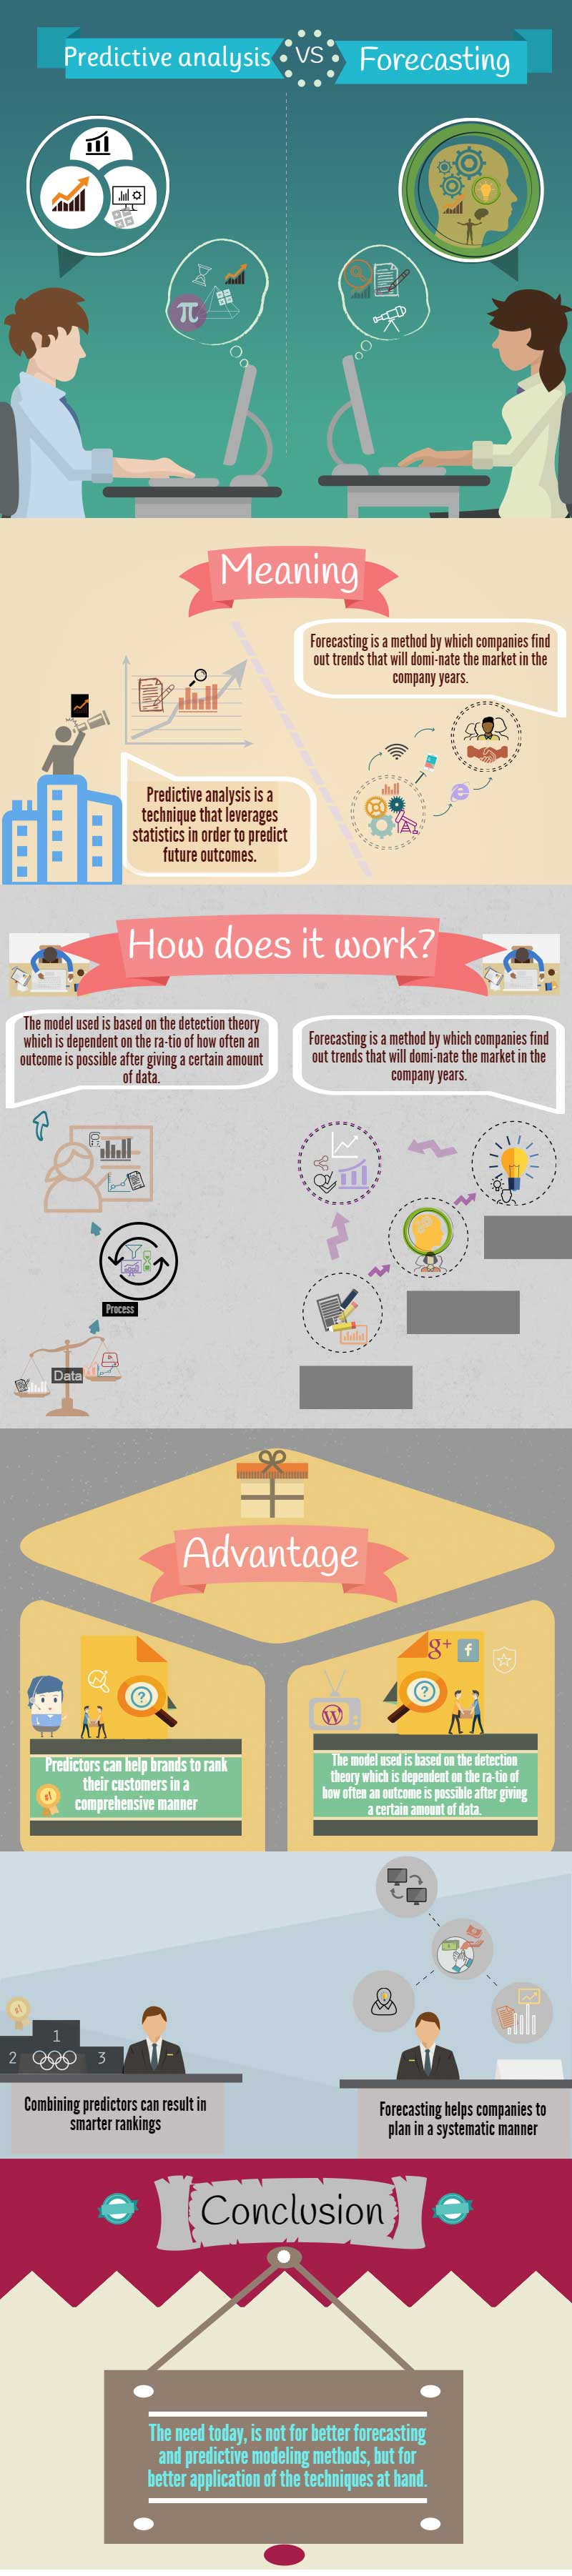 predictive-modeling-vs-forecasting-infographic